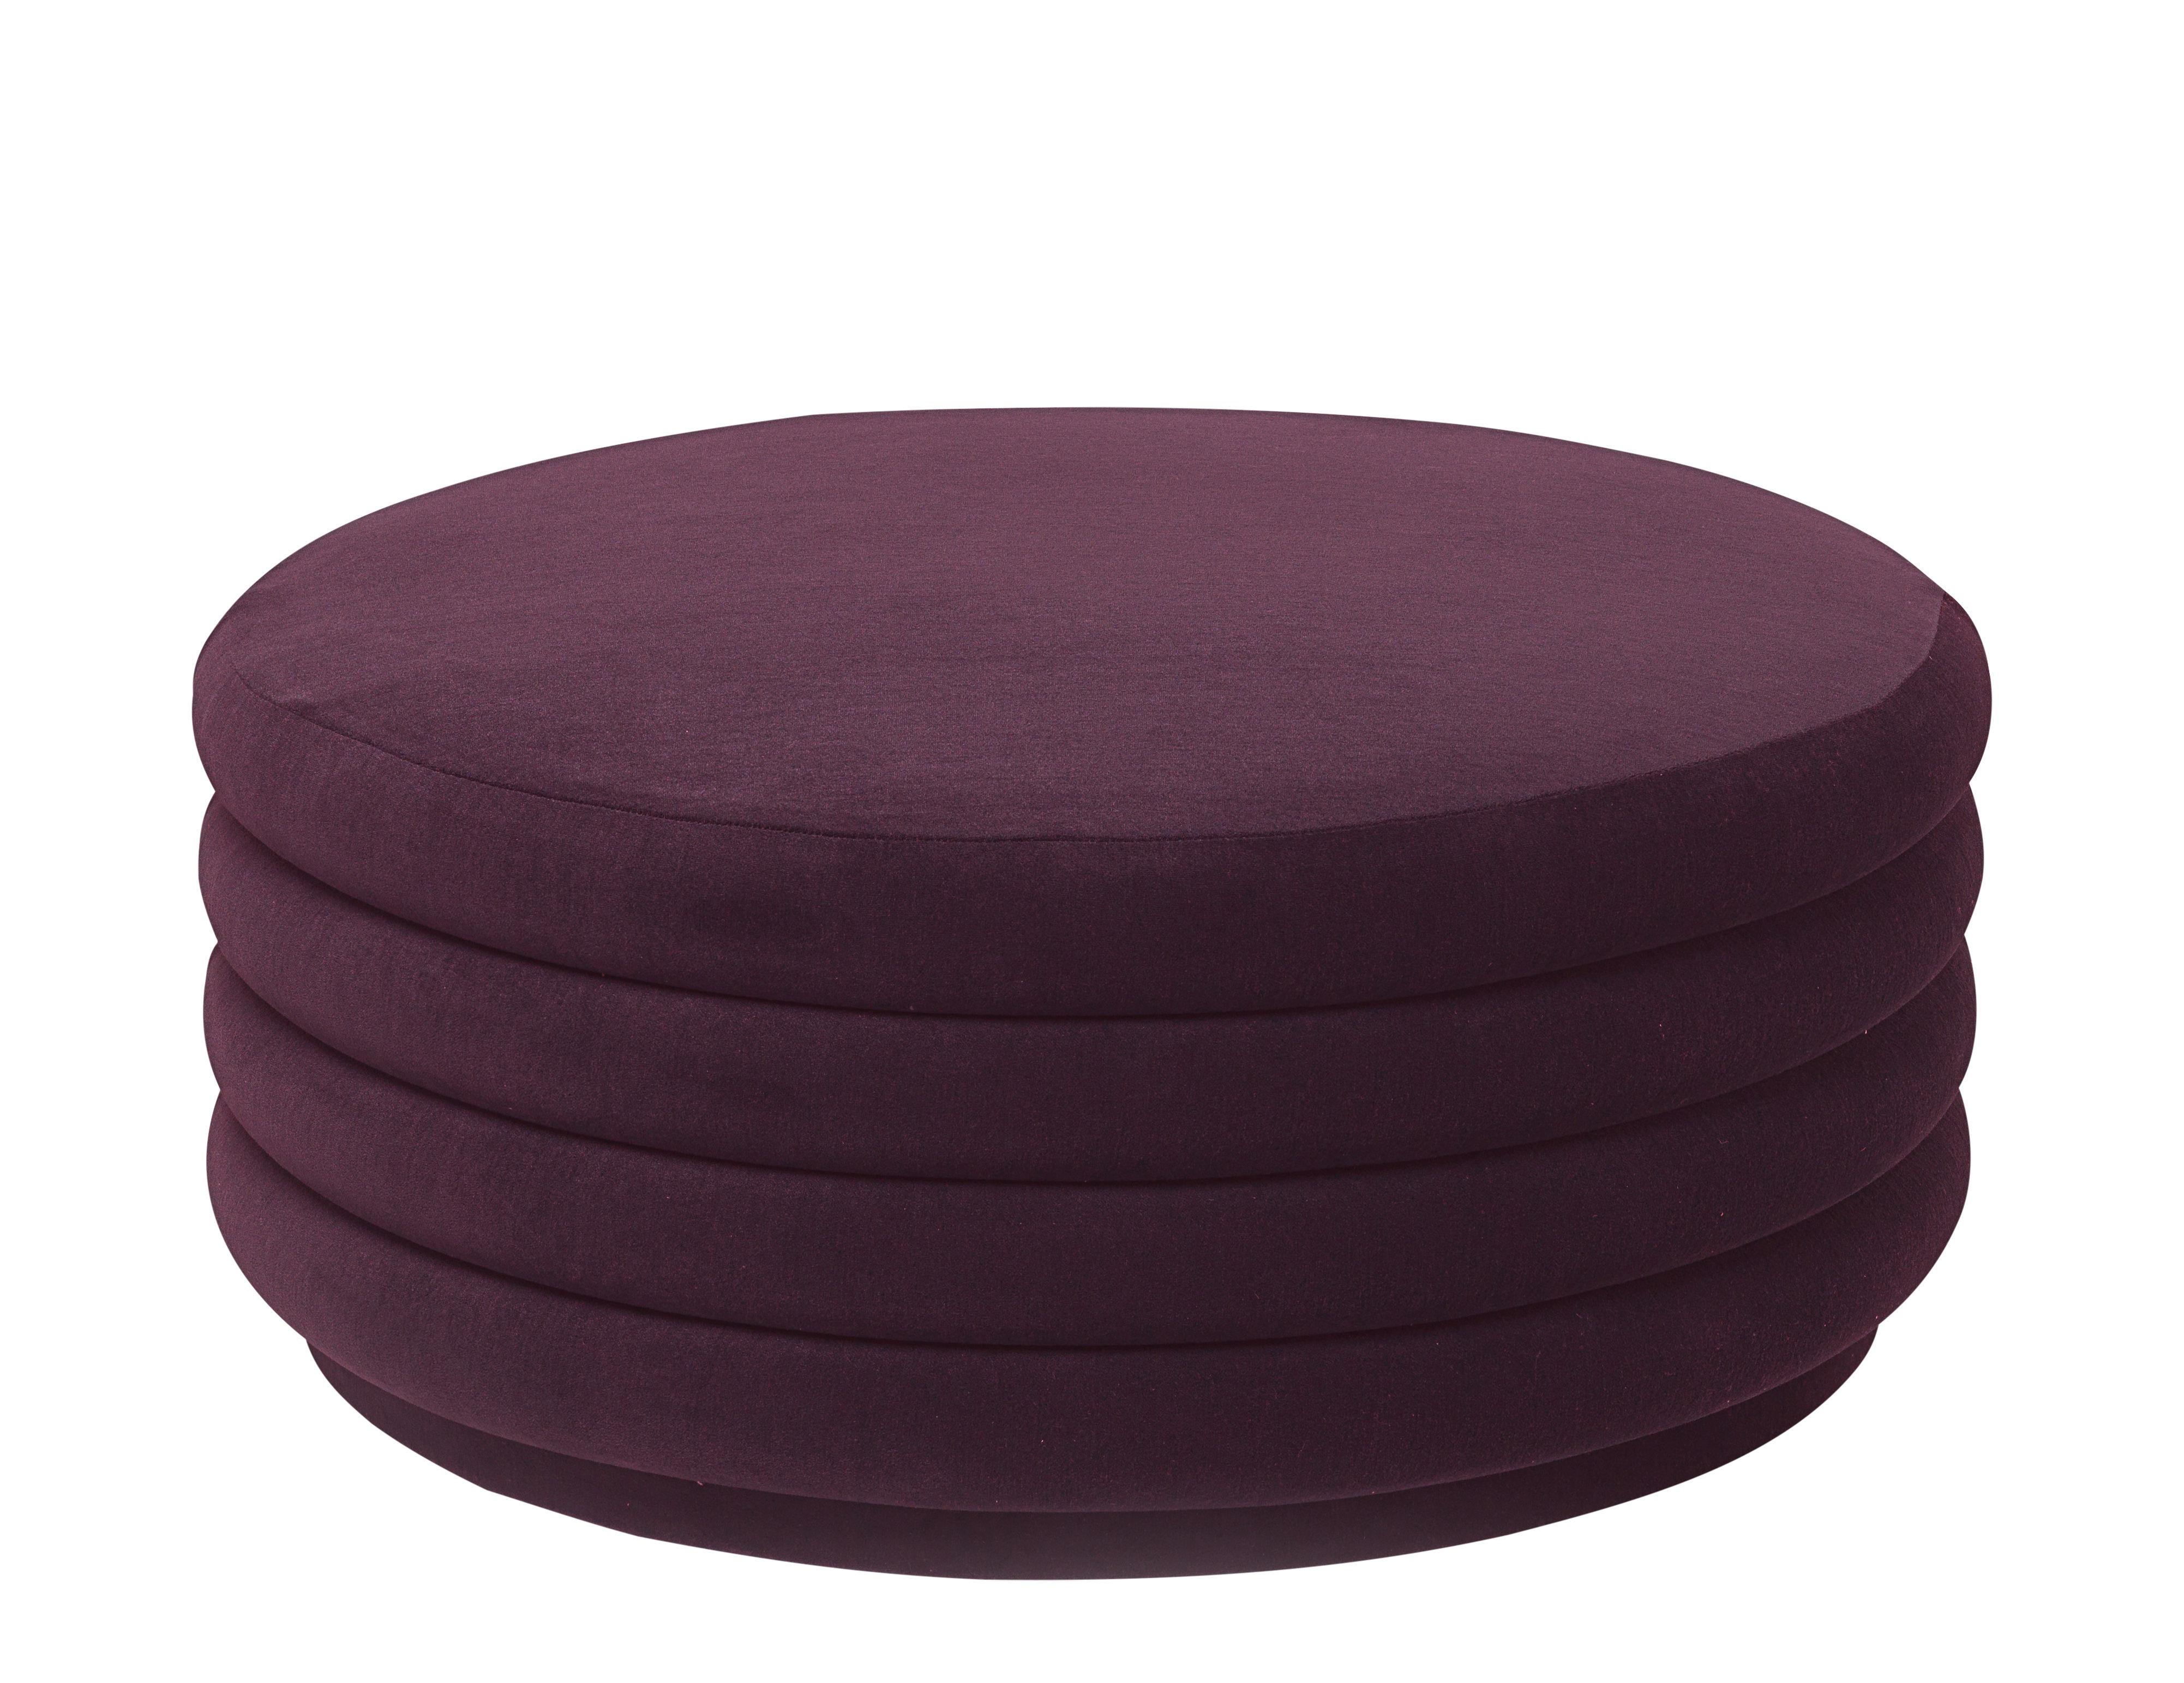 Möbel - Sitzkissen - Round Large Sitzkissen / Ø 90 cm - Velours - Ferm Living - Bordeaux-rot - Holz, Schaumstoff, Velours